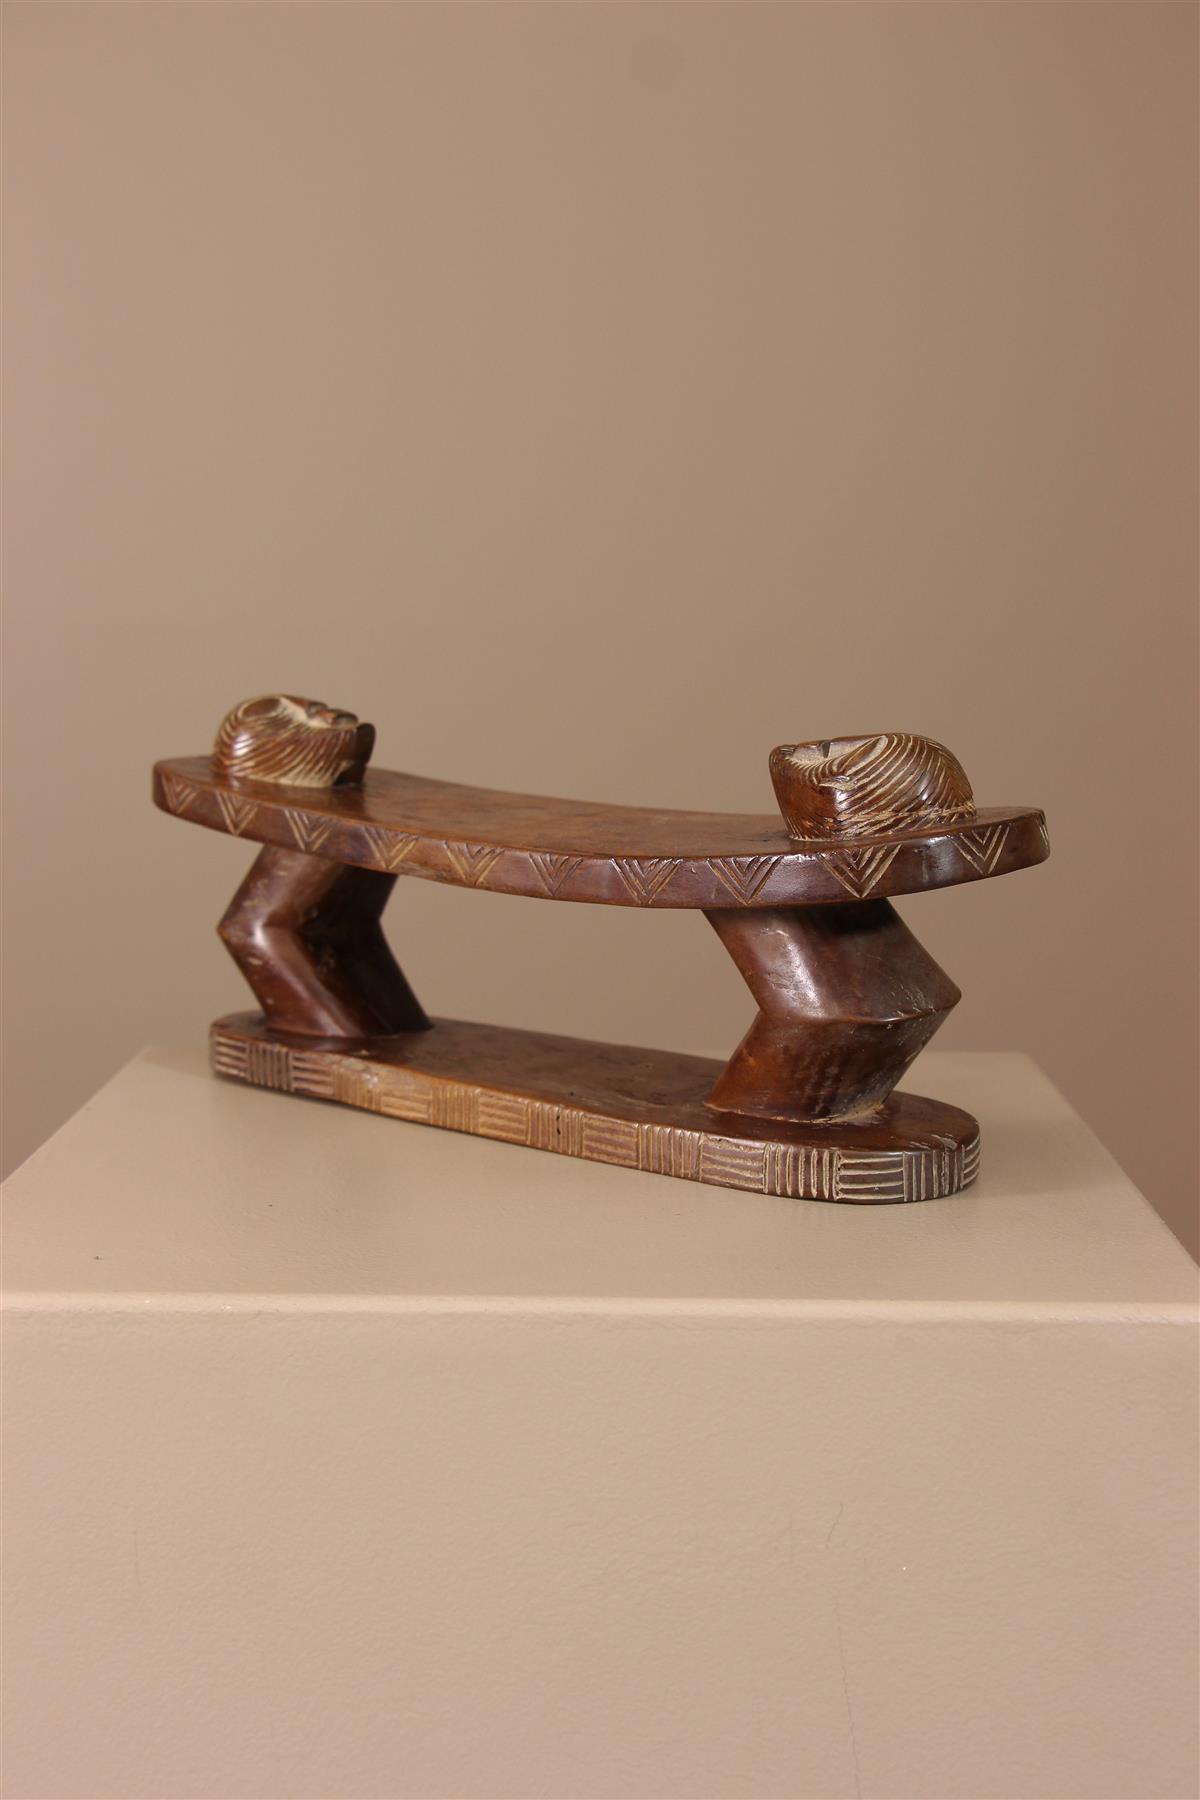 Appui-nuque Songye - Déco africaine - Art africain traditionnel